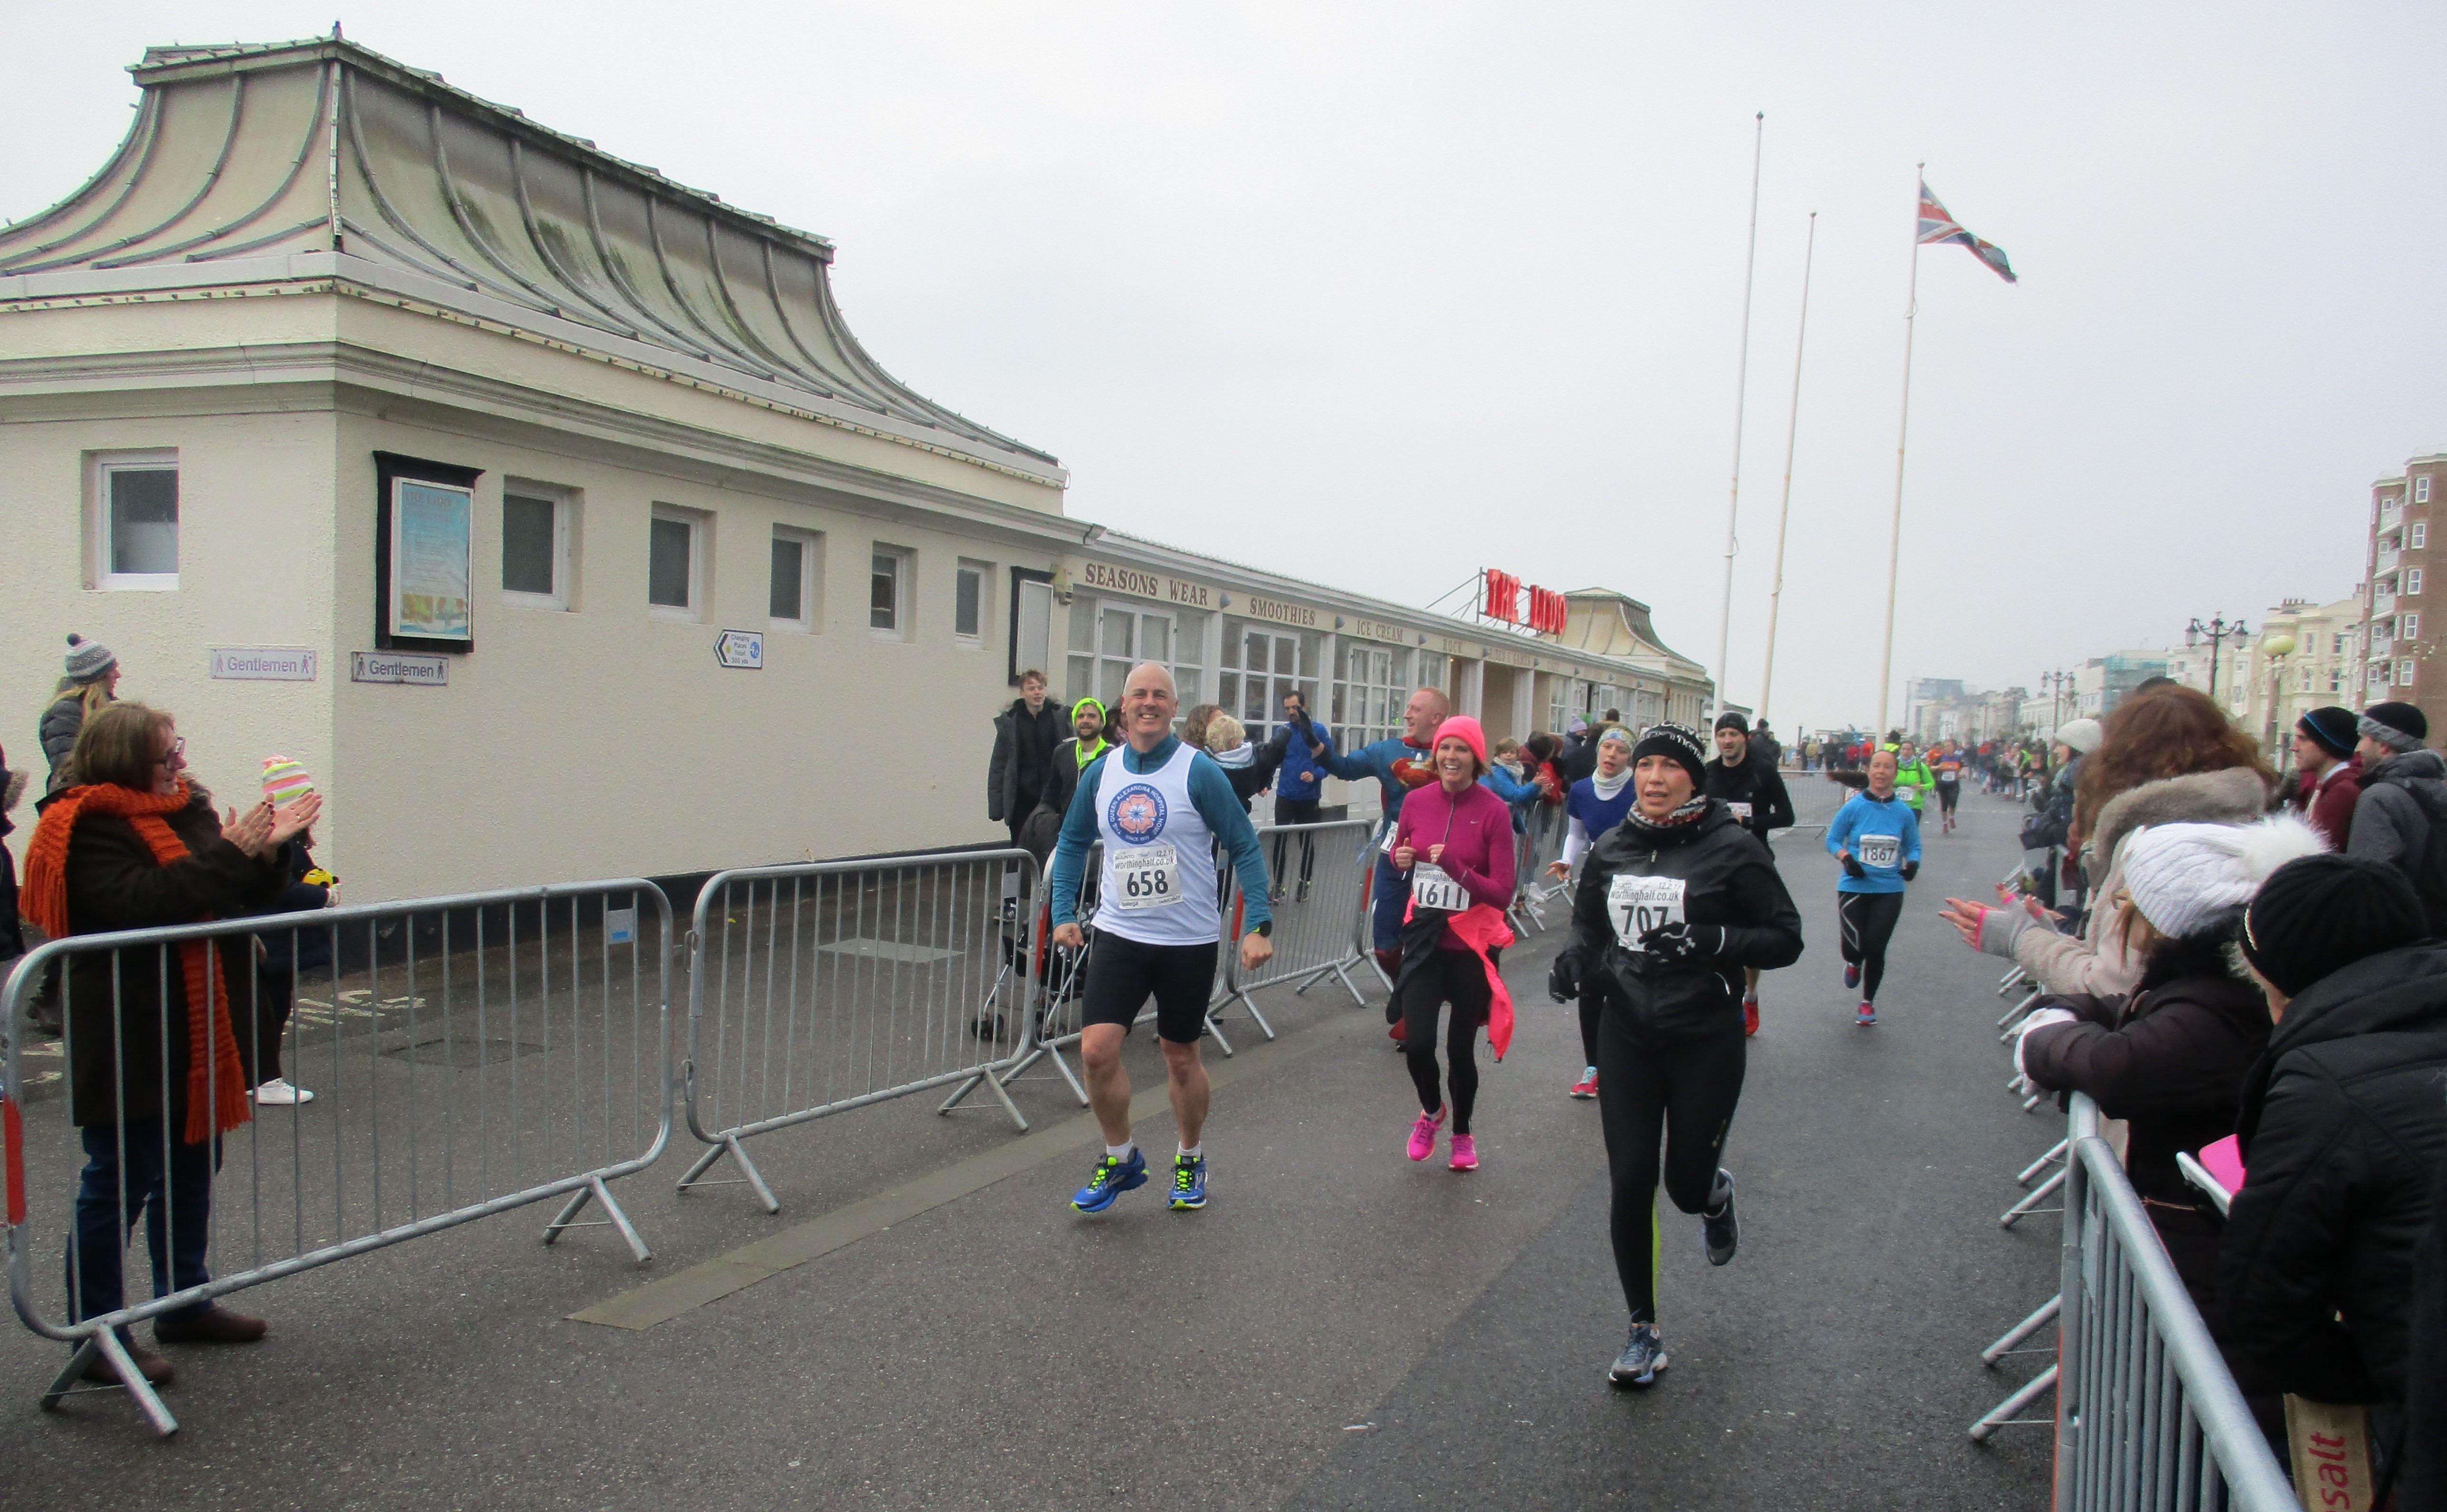 Half Marathon Runners Raise Over £1,000 for Disabled Veterans - Cobseo